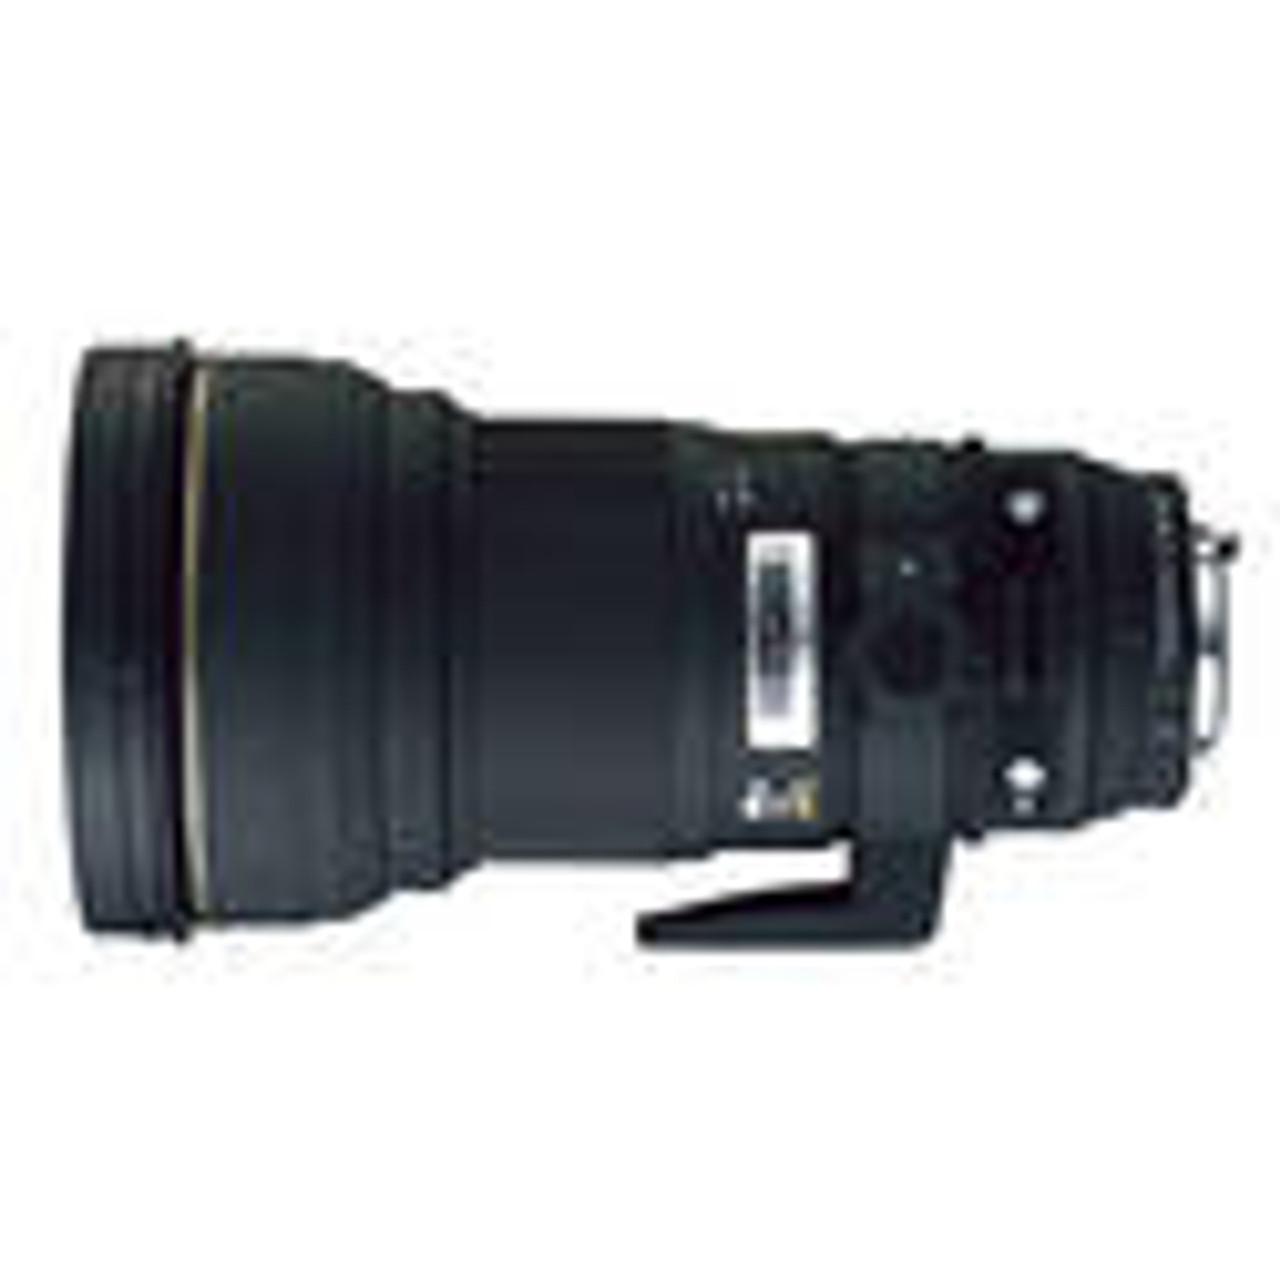 Sigma APO 300mm f/2.8 EX DG HSM Lens for Nikon F